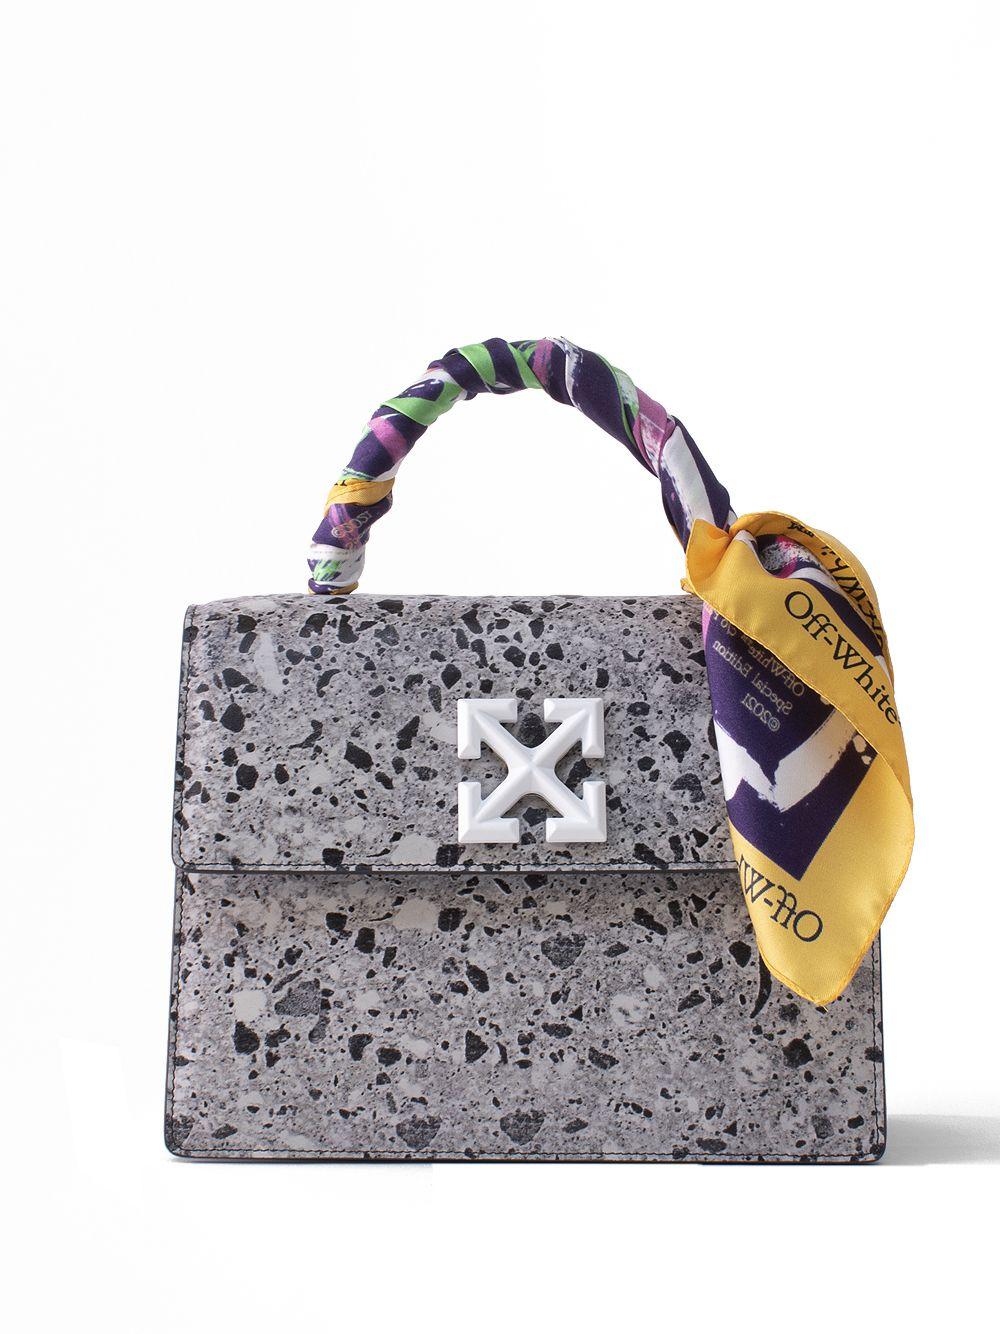 Jitney 2.8 handbag by Patricia Urquiola